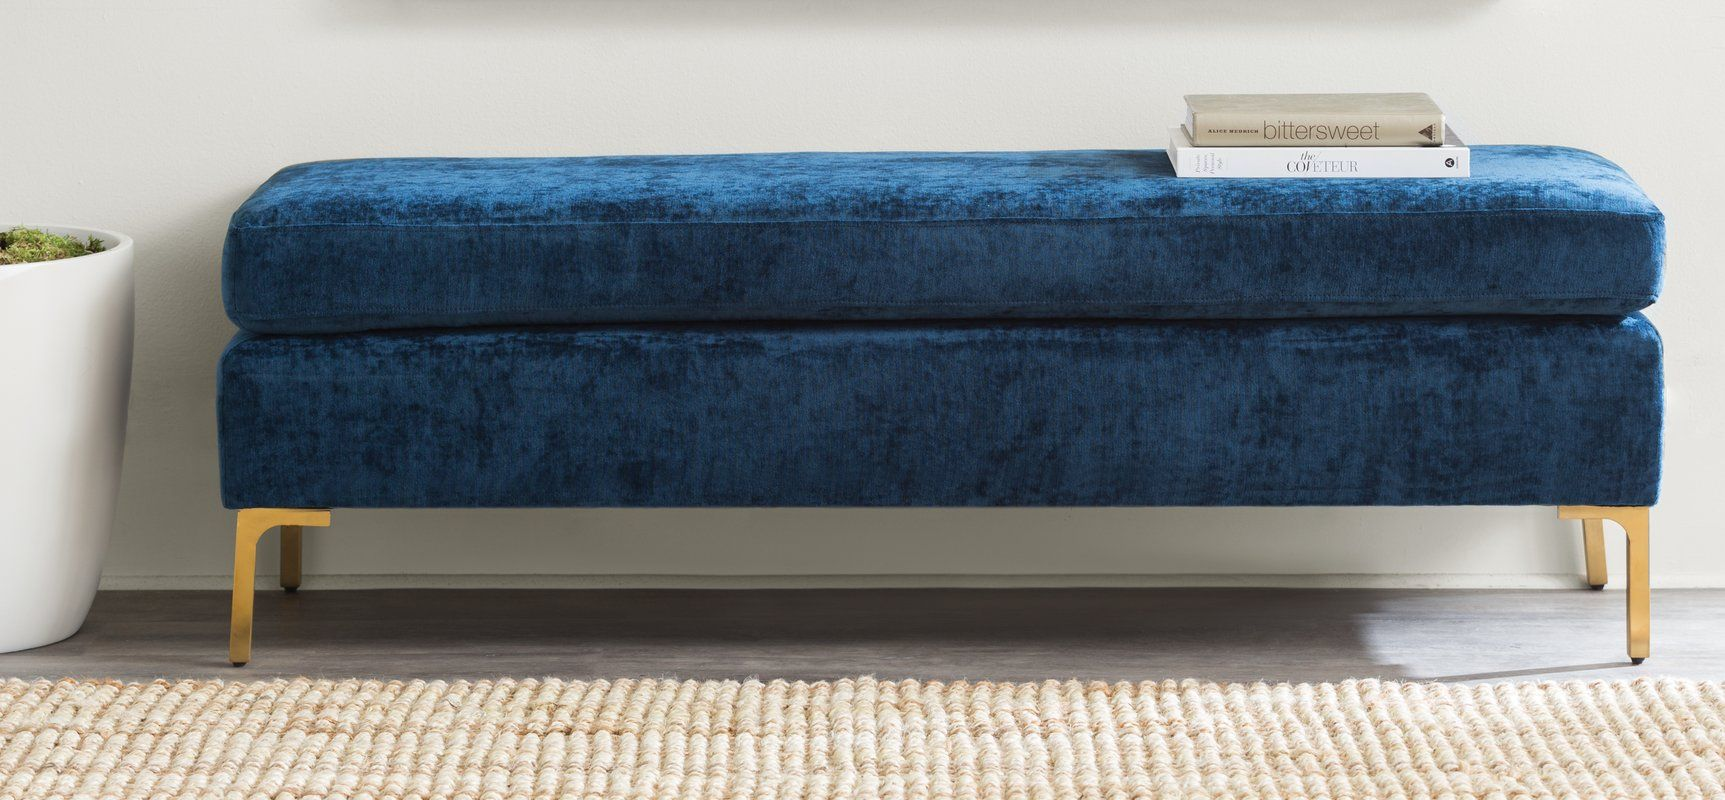 Melvin Upholstered Bench In 2020 Upholstered Bench Bedroom Redesign Upholster #upholstered #bench #for #living #room